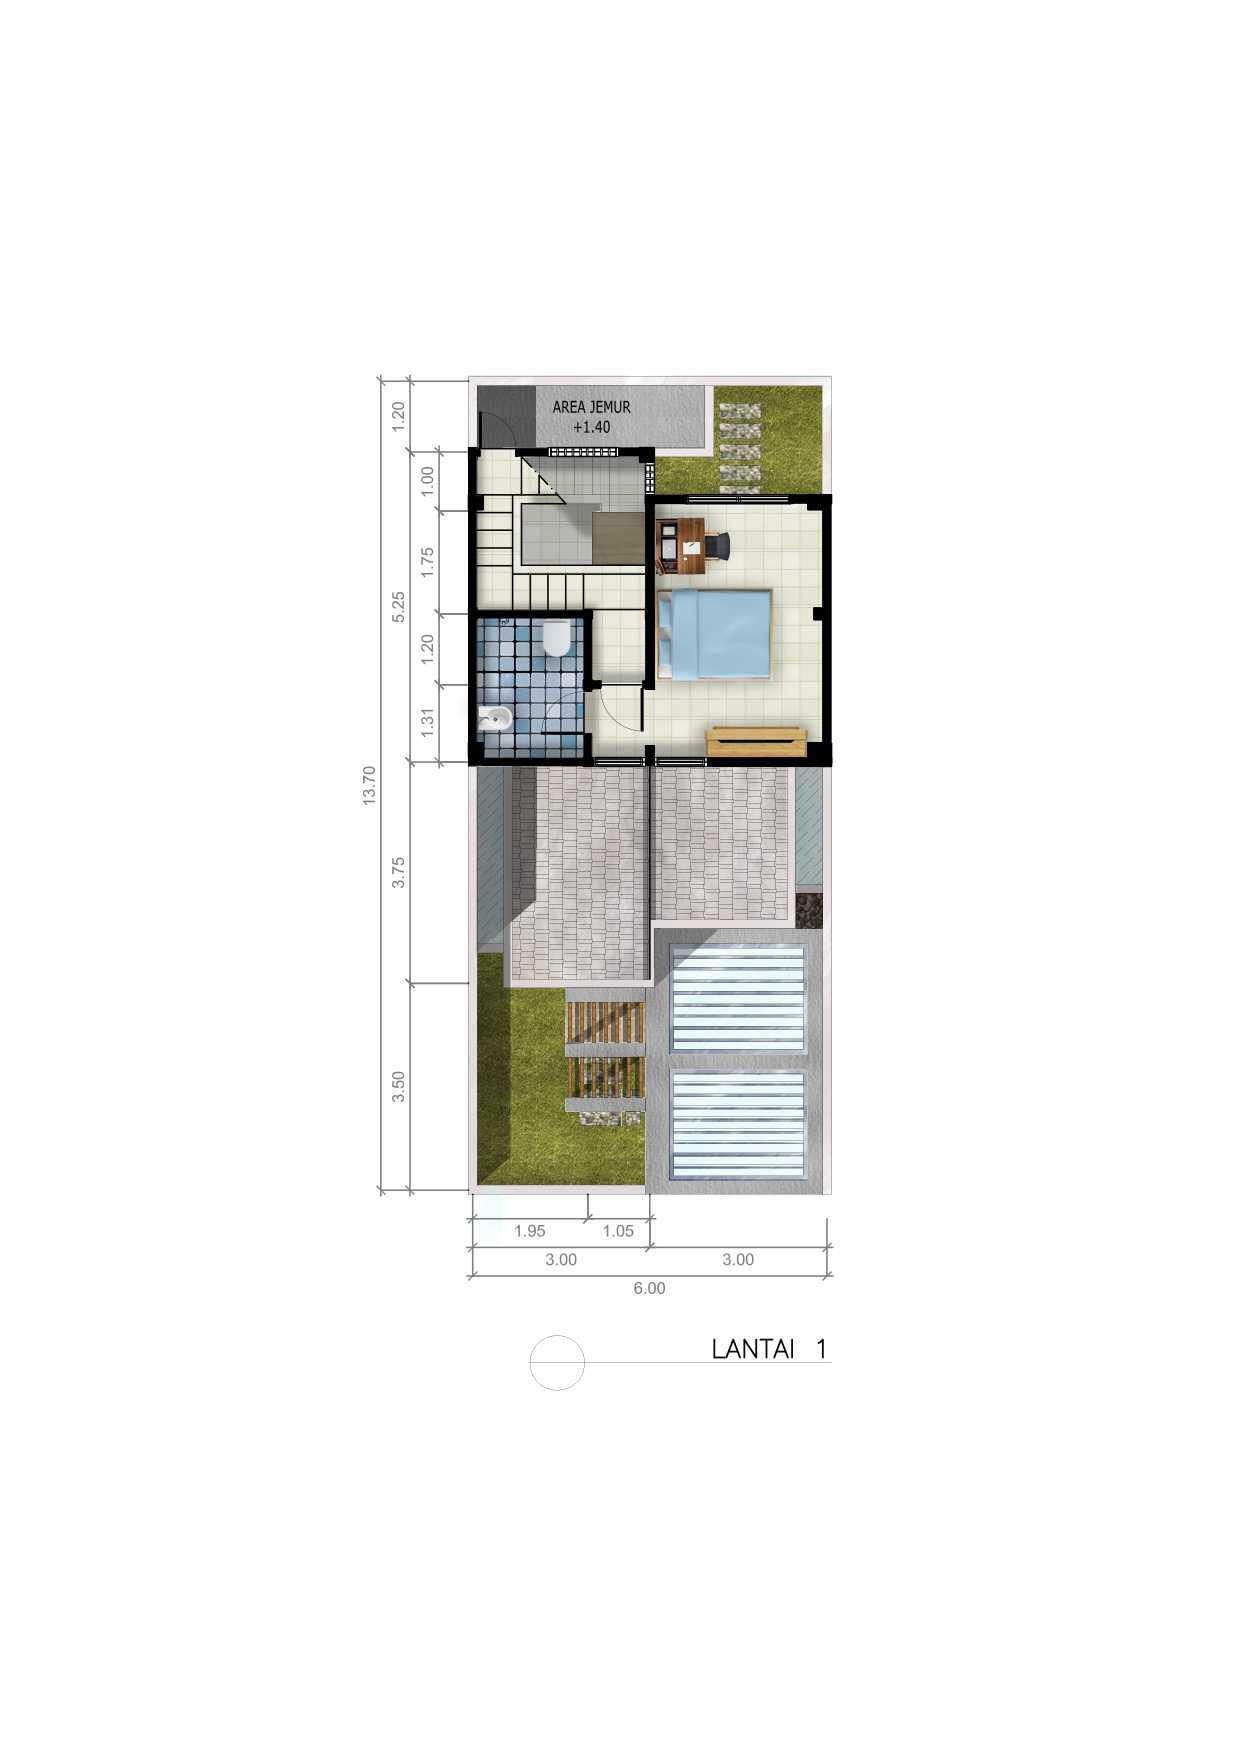 Dap Studio Rumah Bsd Tangerang Tangerang First Floor Plan   20926